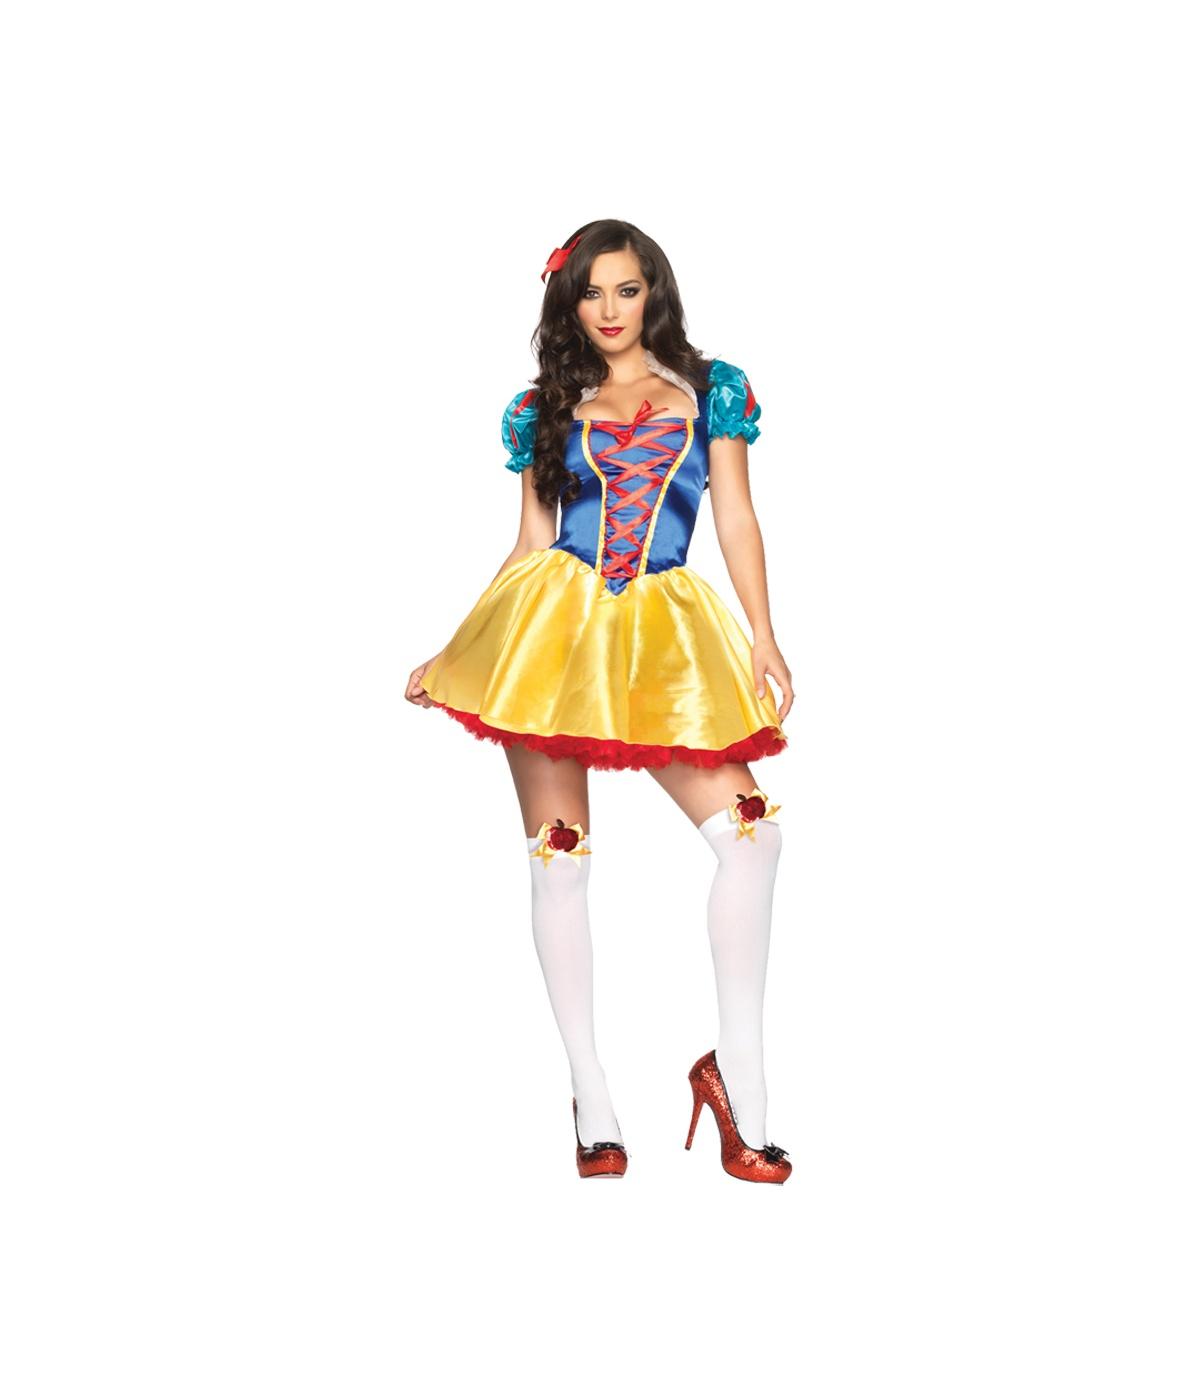 Disney Snow White Fairytale Princess Costume Sexy Costume